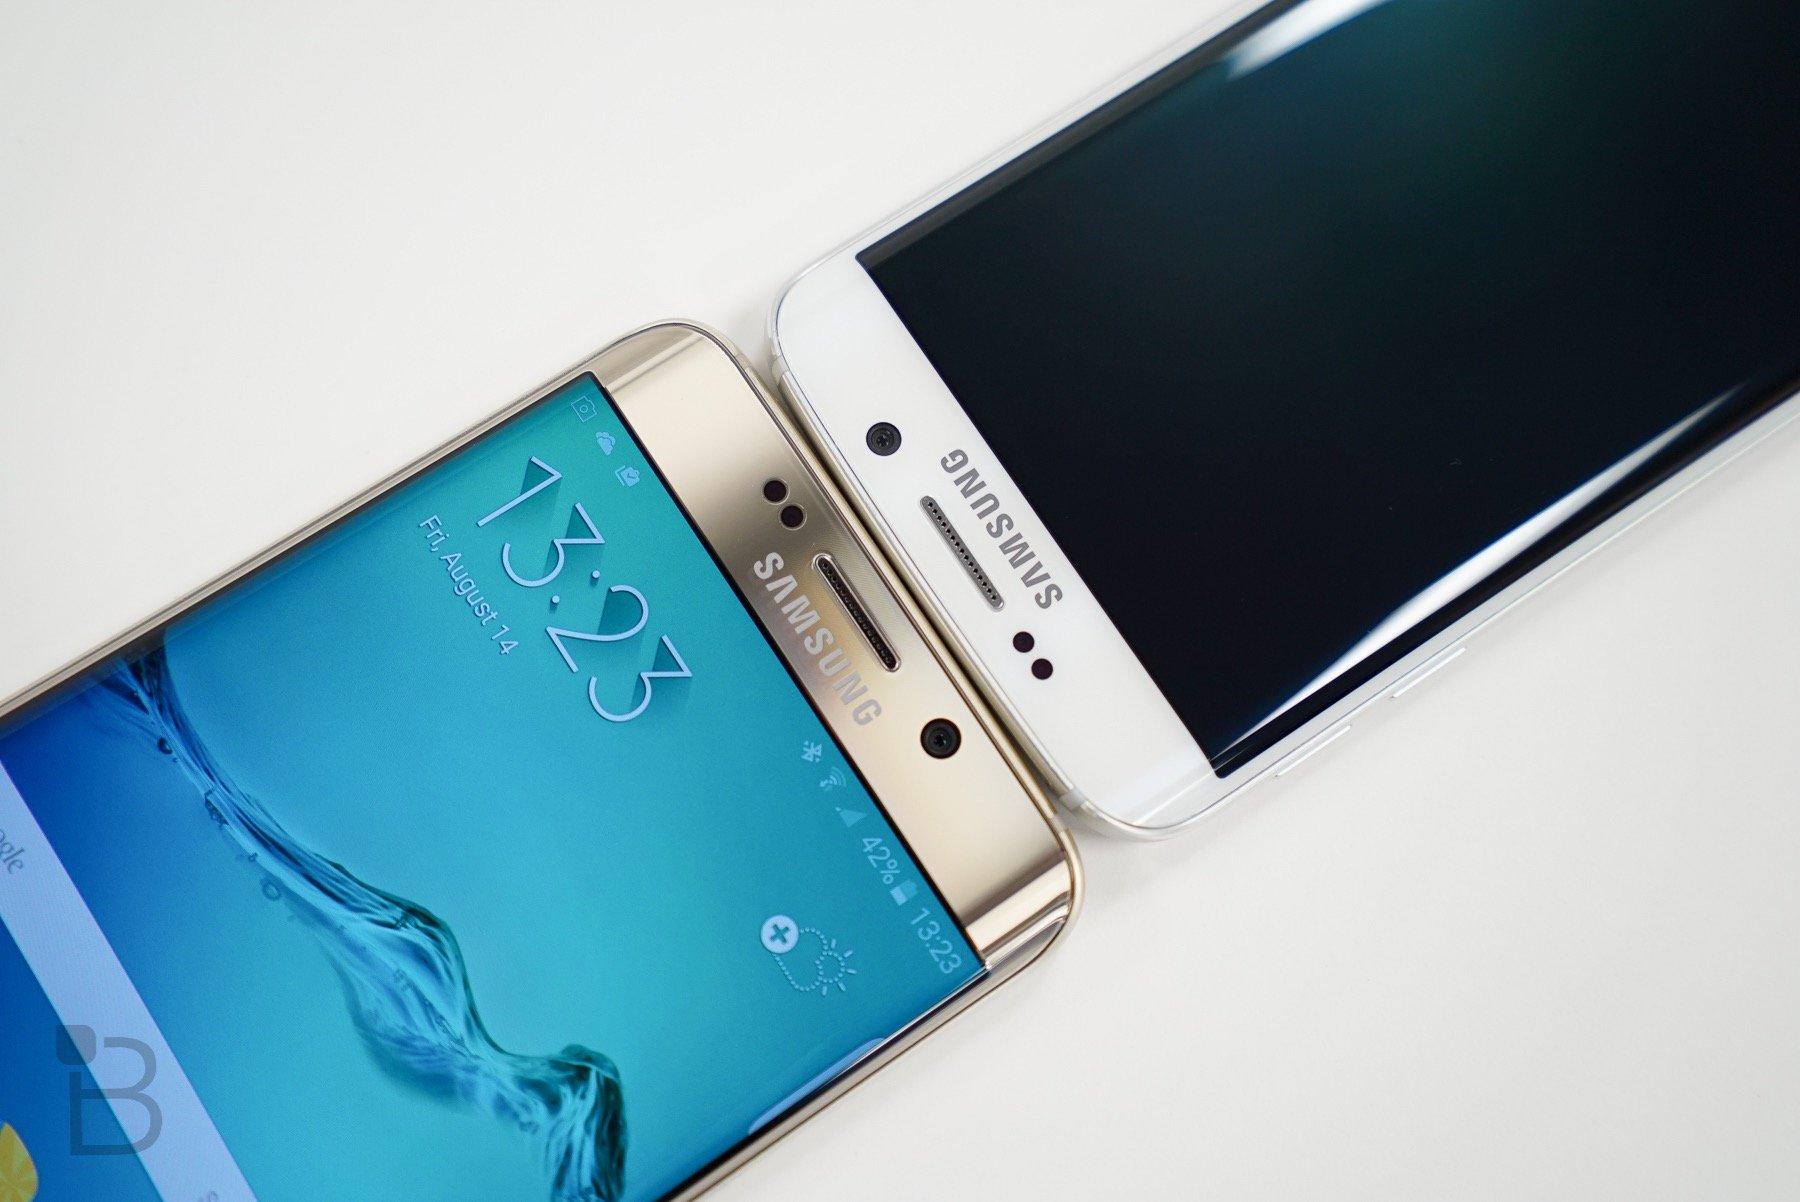 Samsung galaxy s7 rumors